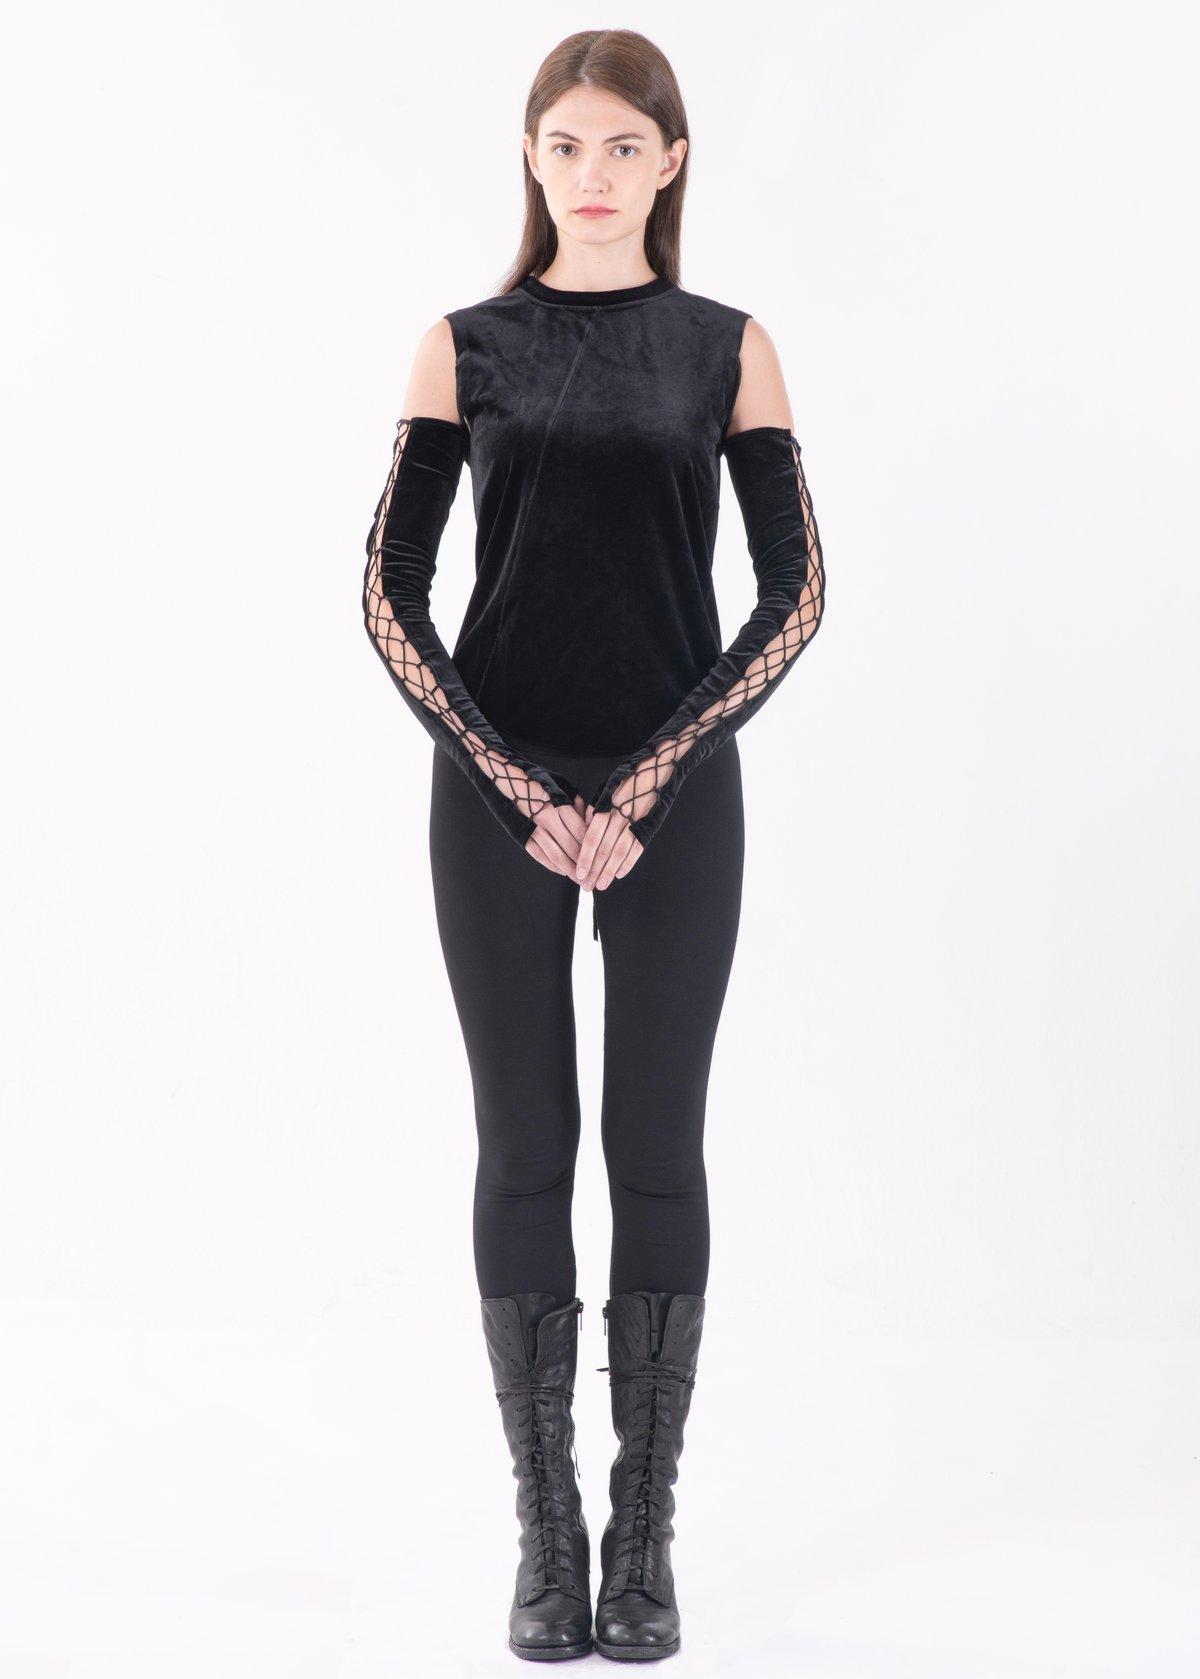 Image of Lace Up Arm Gloves in Black Velvet